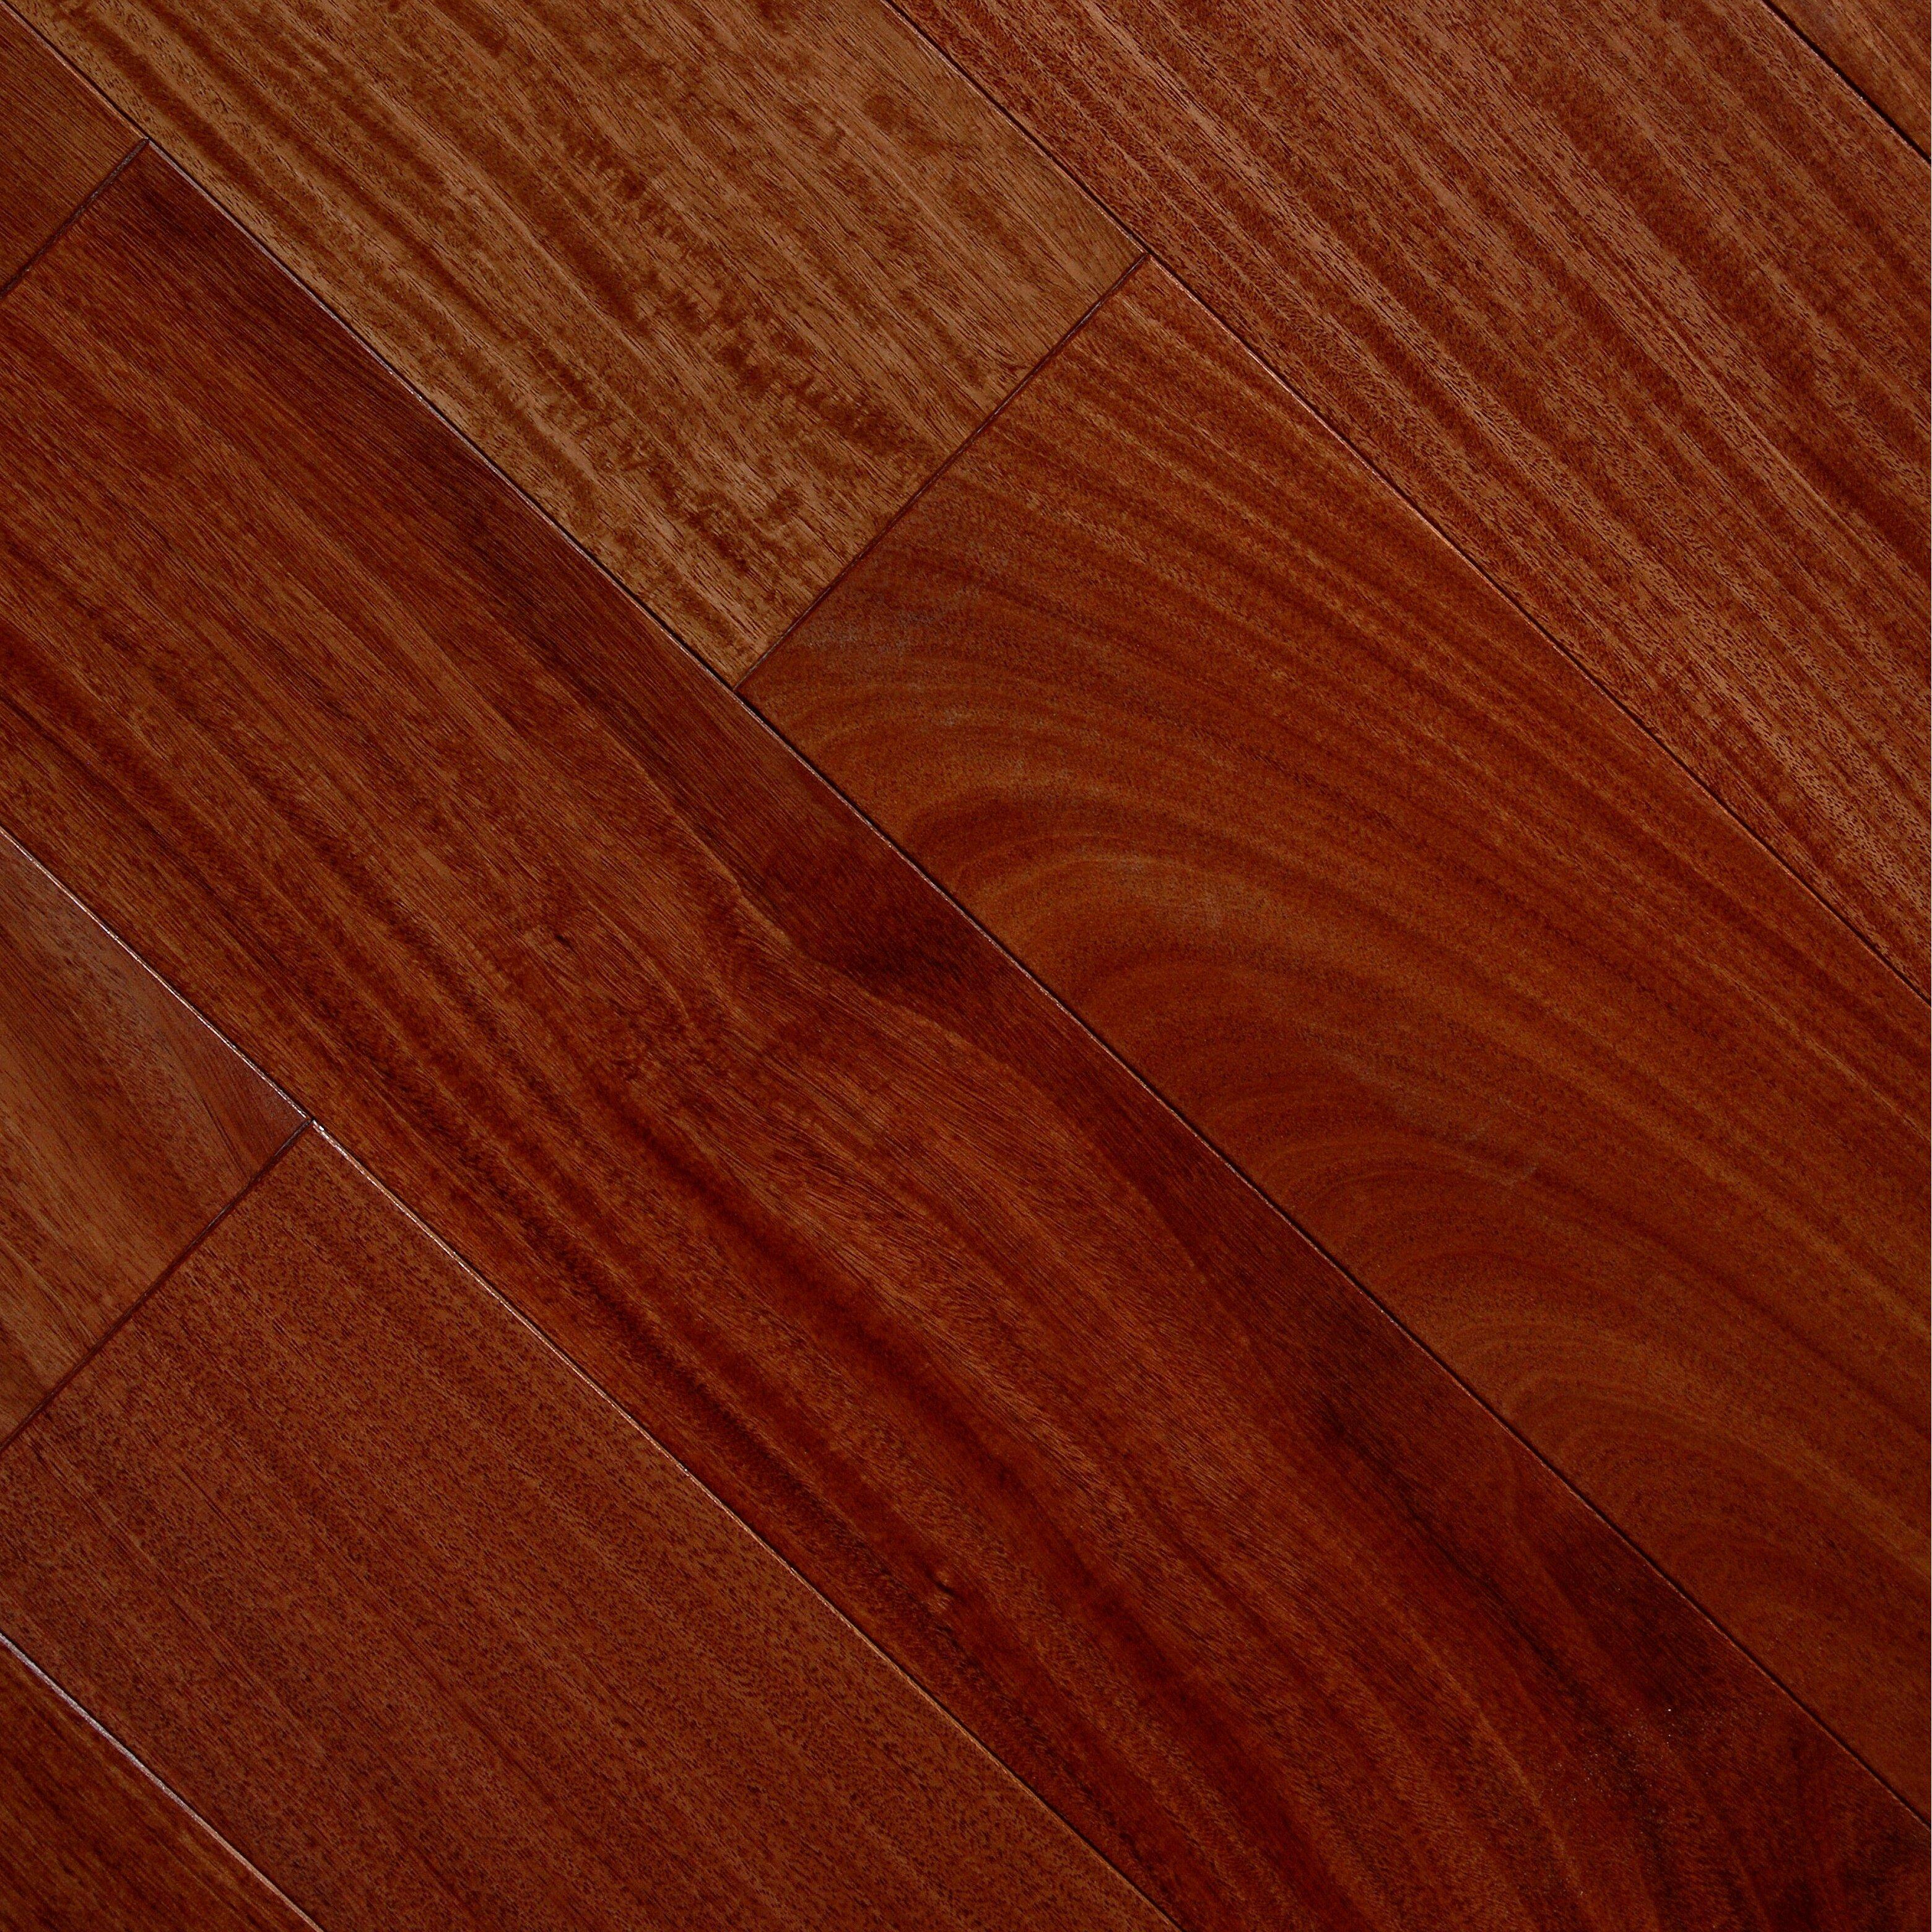 Wood Floors Mahogany Images Guru - ^